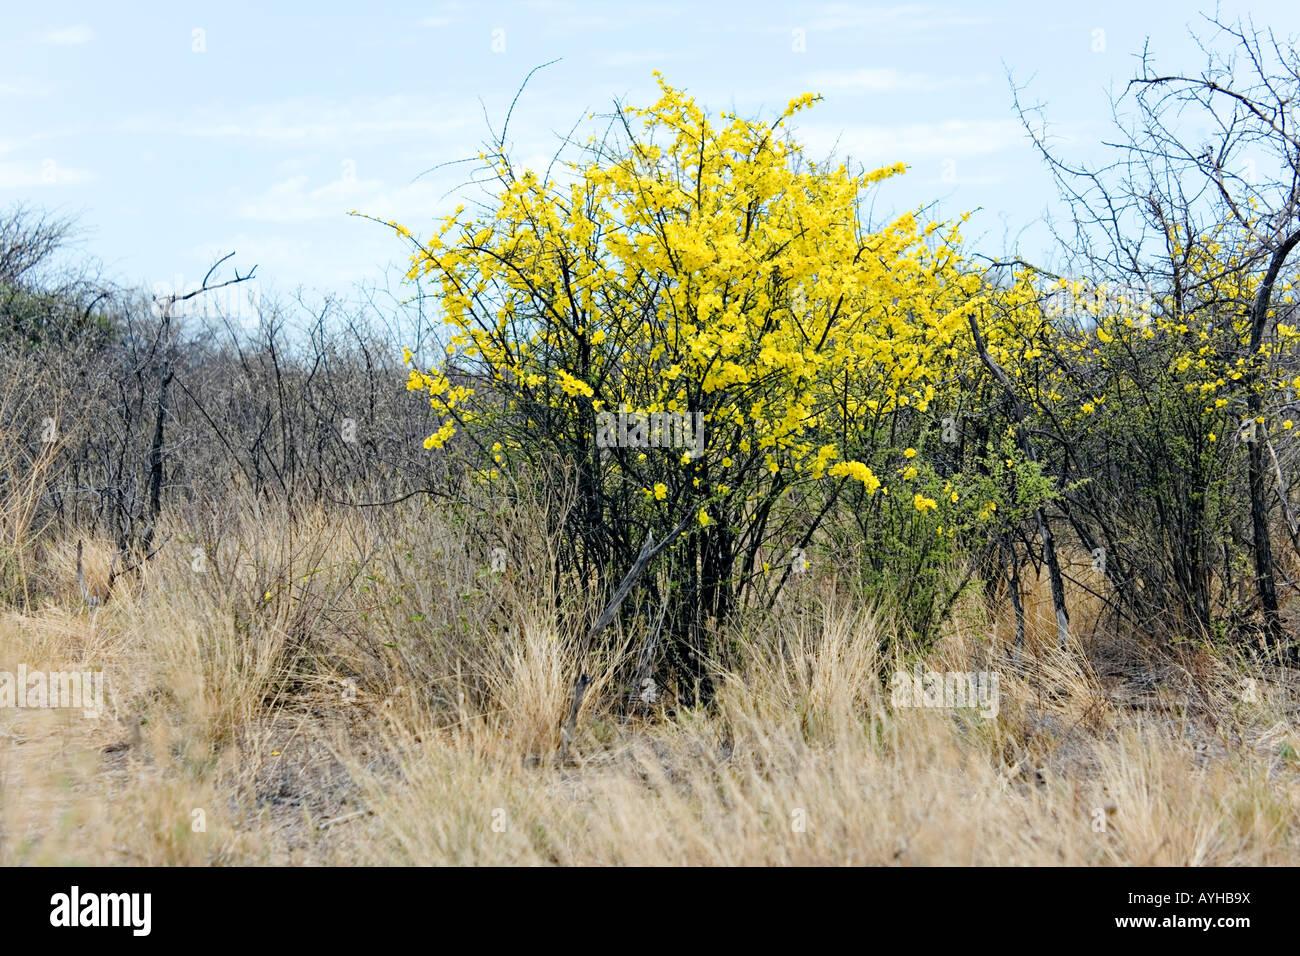 Western Rhigozum Rhigozum Brevispinosum Tree Stock Photos Western